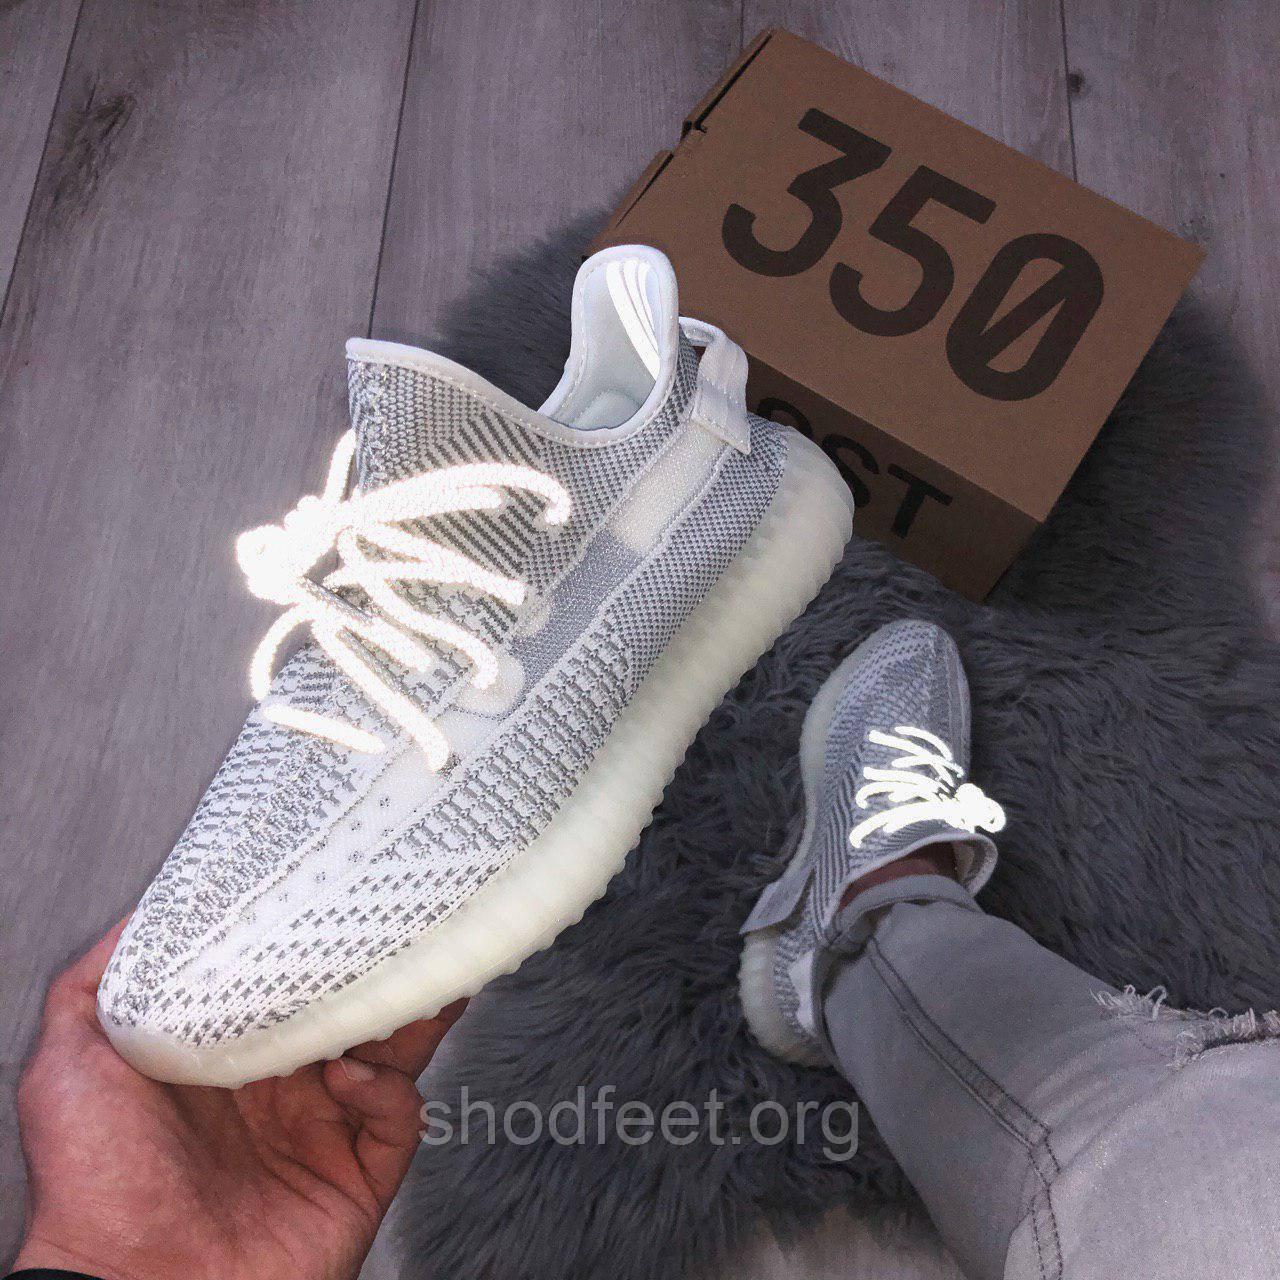 Мужские кроссовки Adidas Yeezy Boost 350 V2 Static